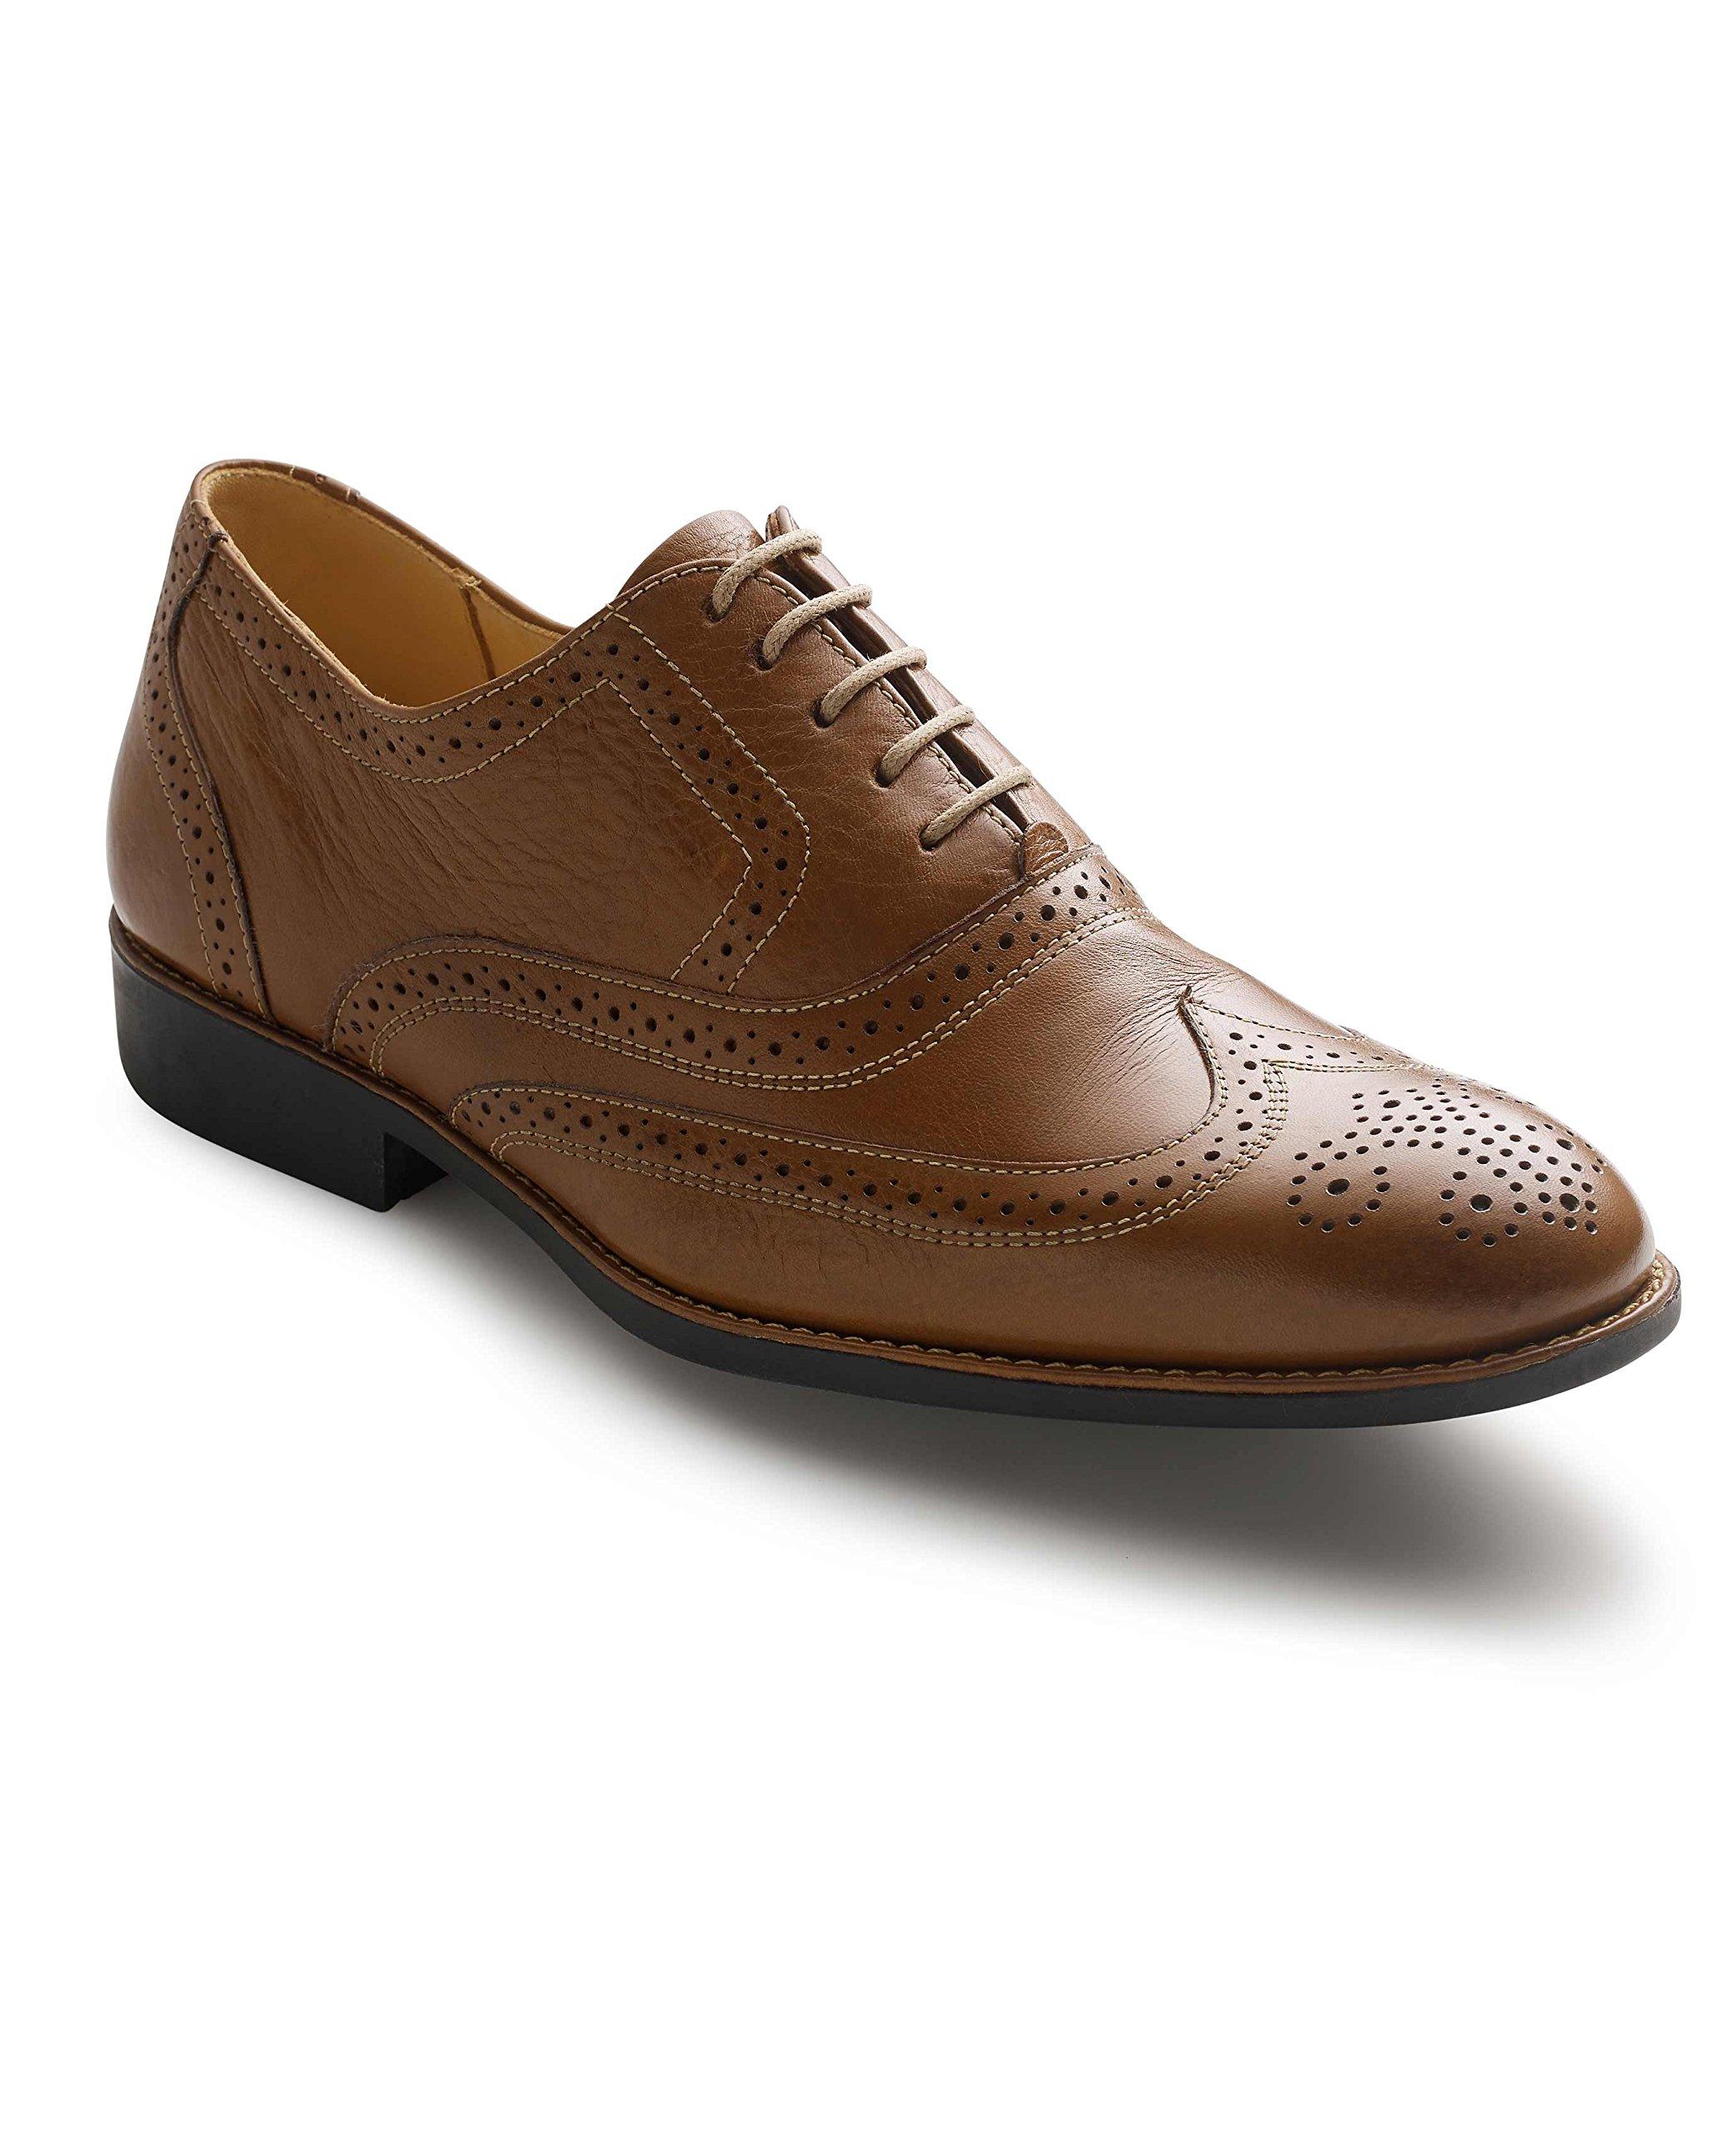 Savile Row Men's Tan Leather Full Brogue Shoes 10